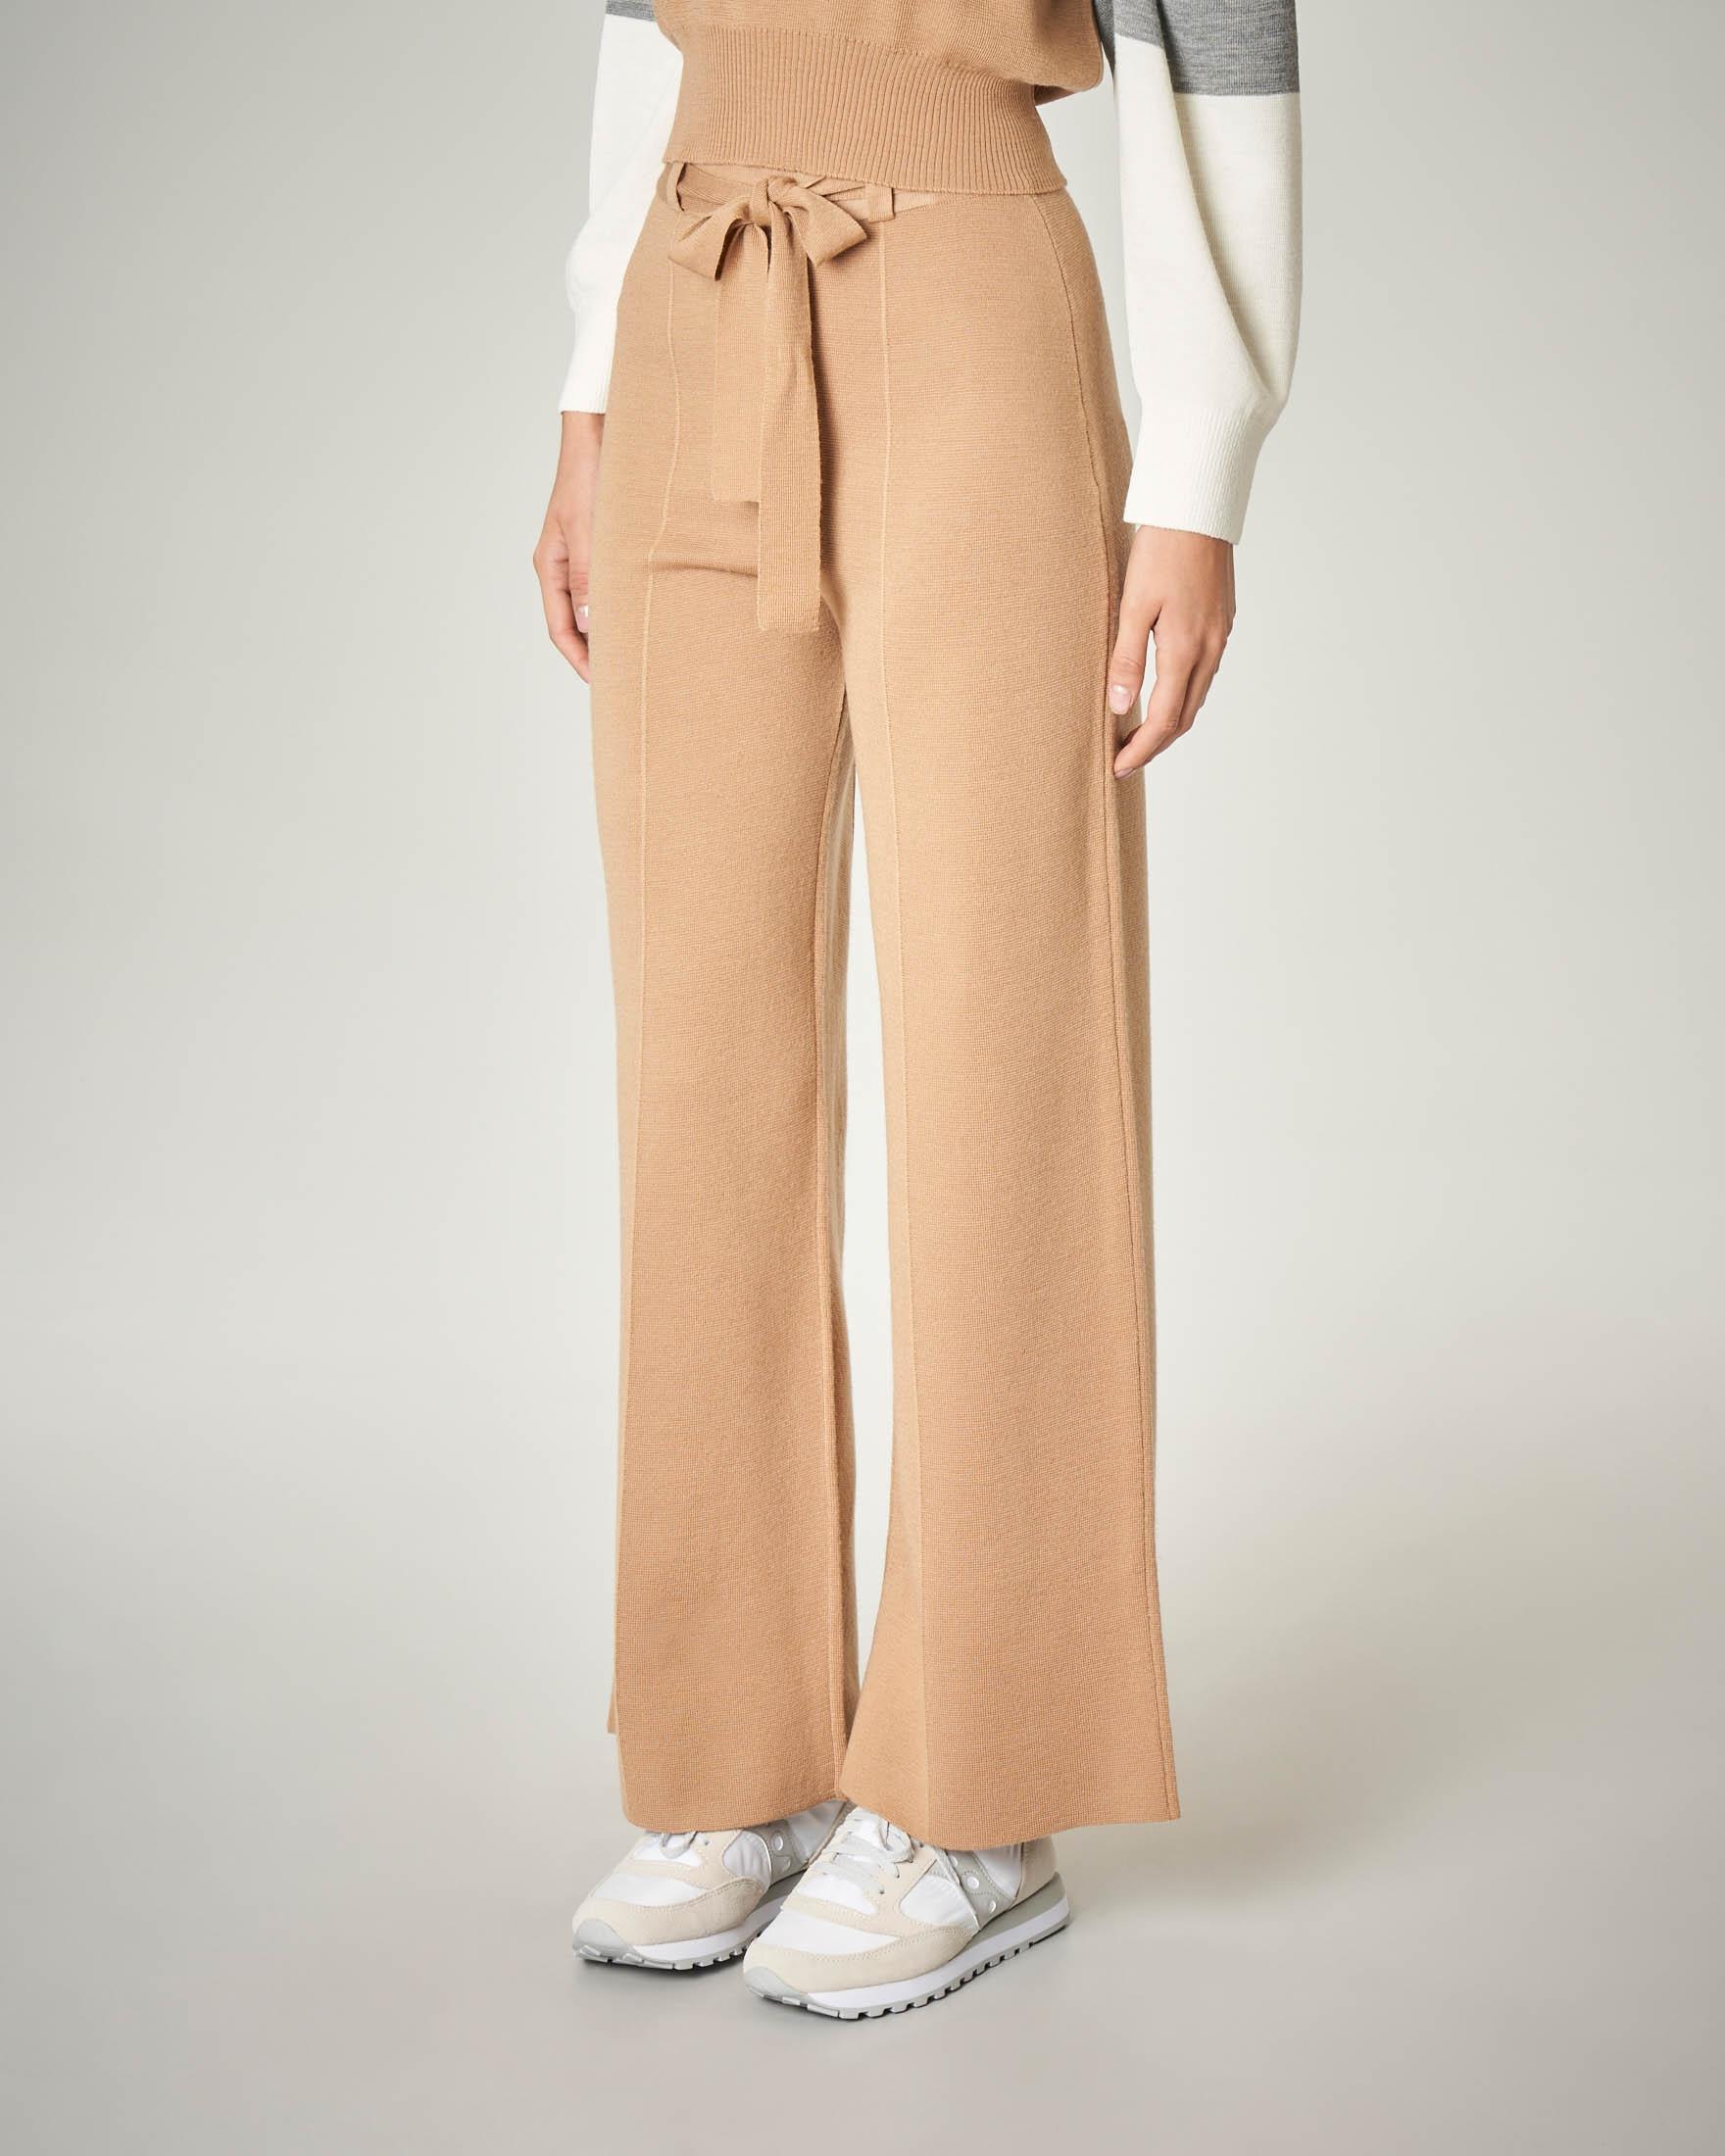 Pantalone palazzo cammello in misto lana